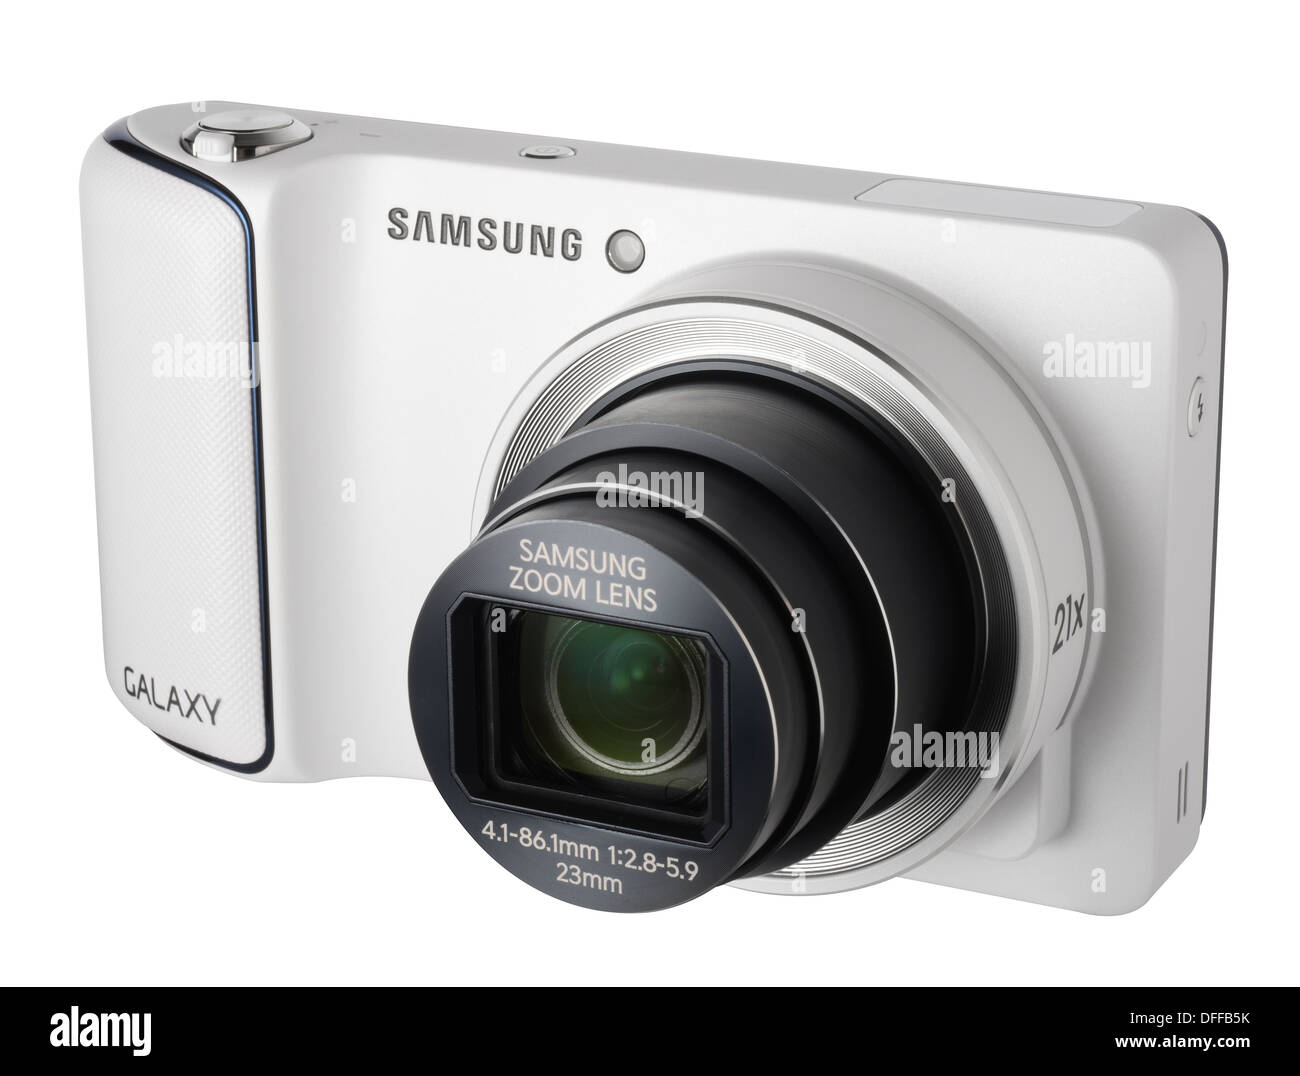 Samsung Galaxy camera - Stock Image